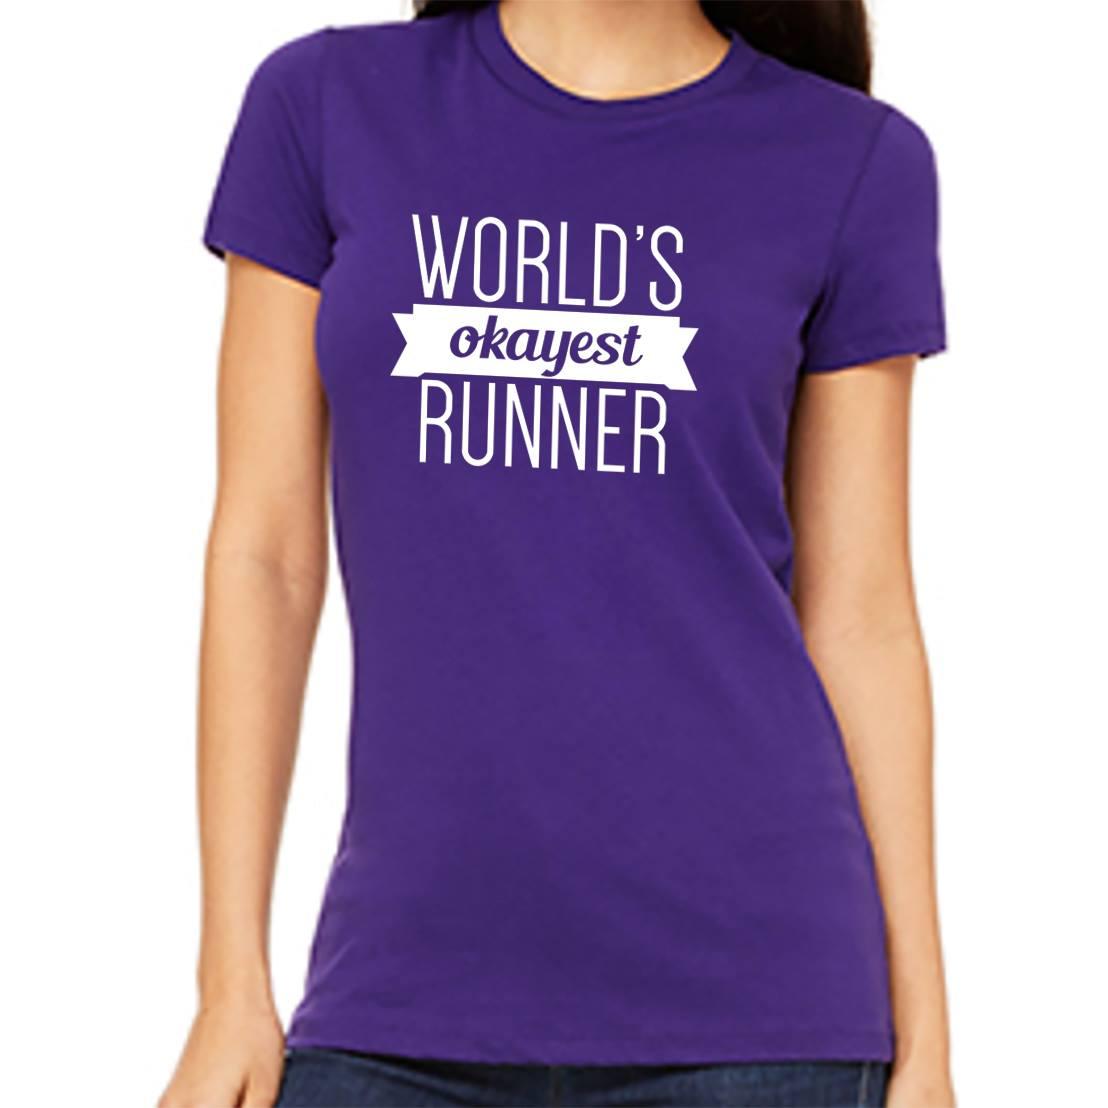 Women's Purple Tee | Running Sayings | Ready Set Run Co